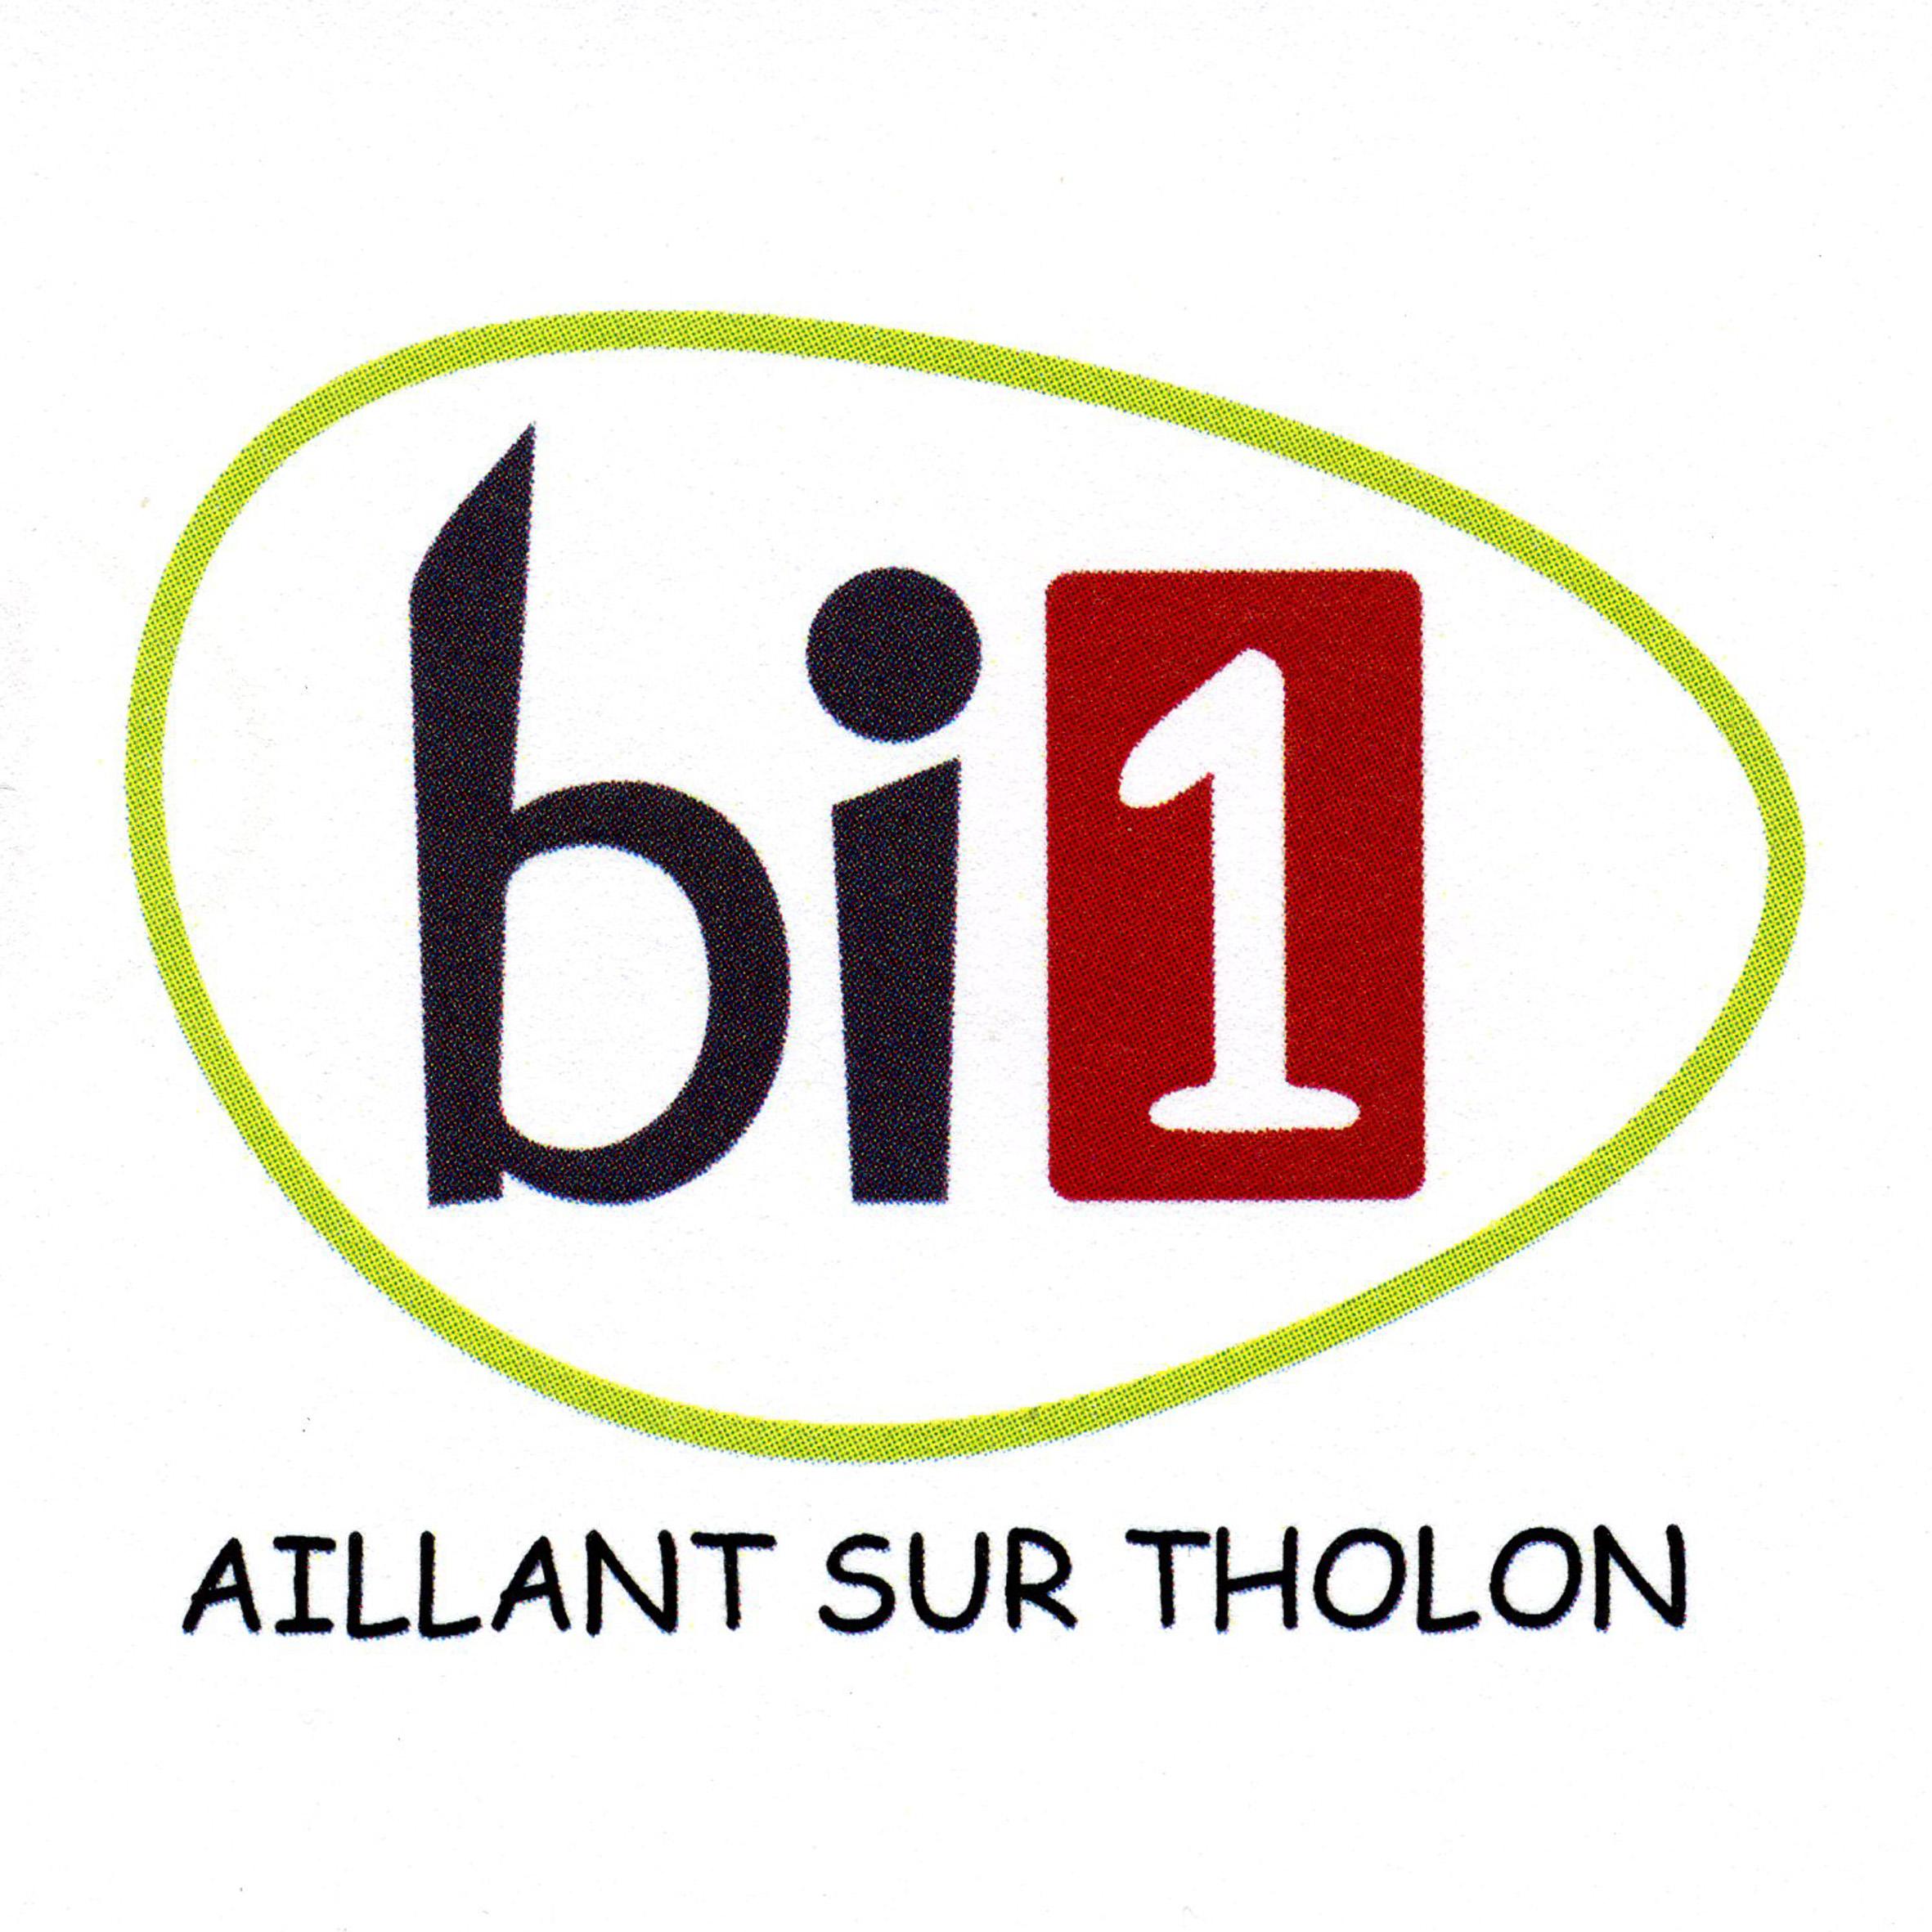 Bi1-6